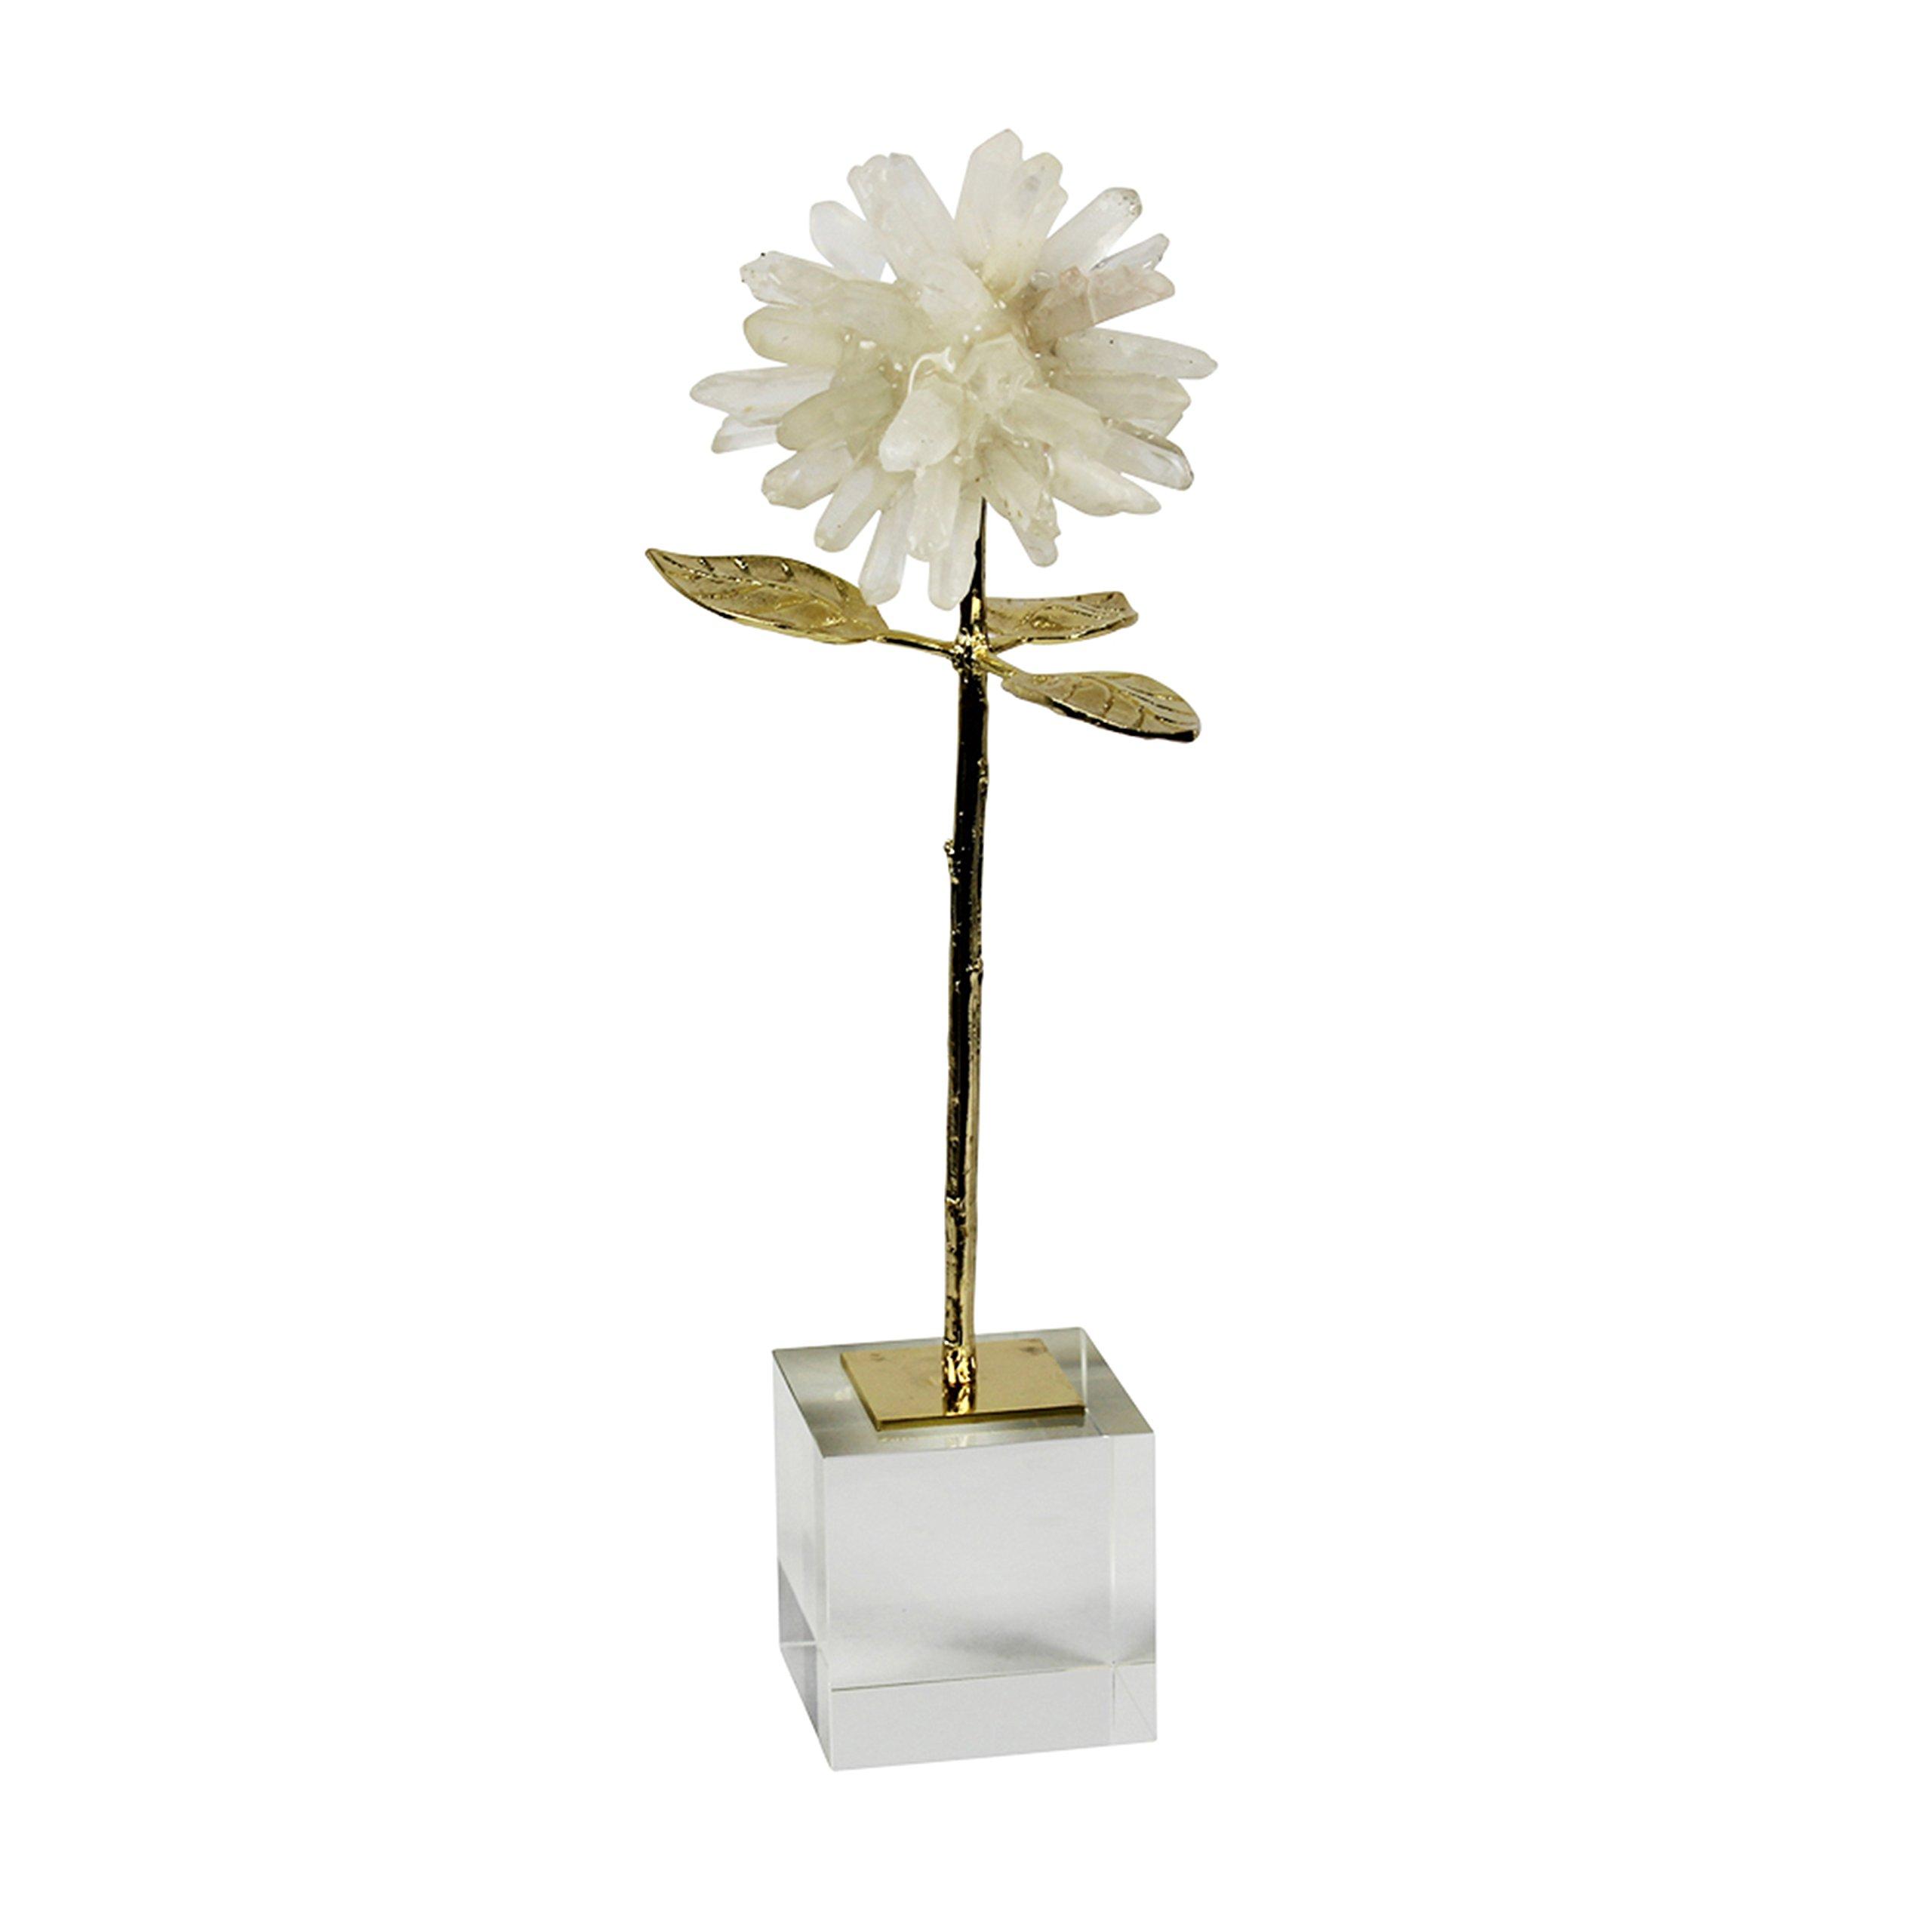 Sagebrook Home Stone & Metal Flower Decor, 5.5x6x15.25, Natural/Gold